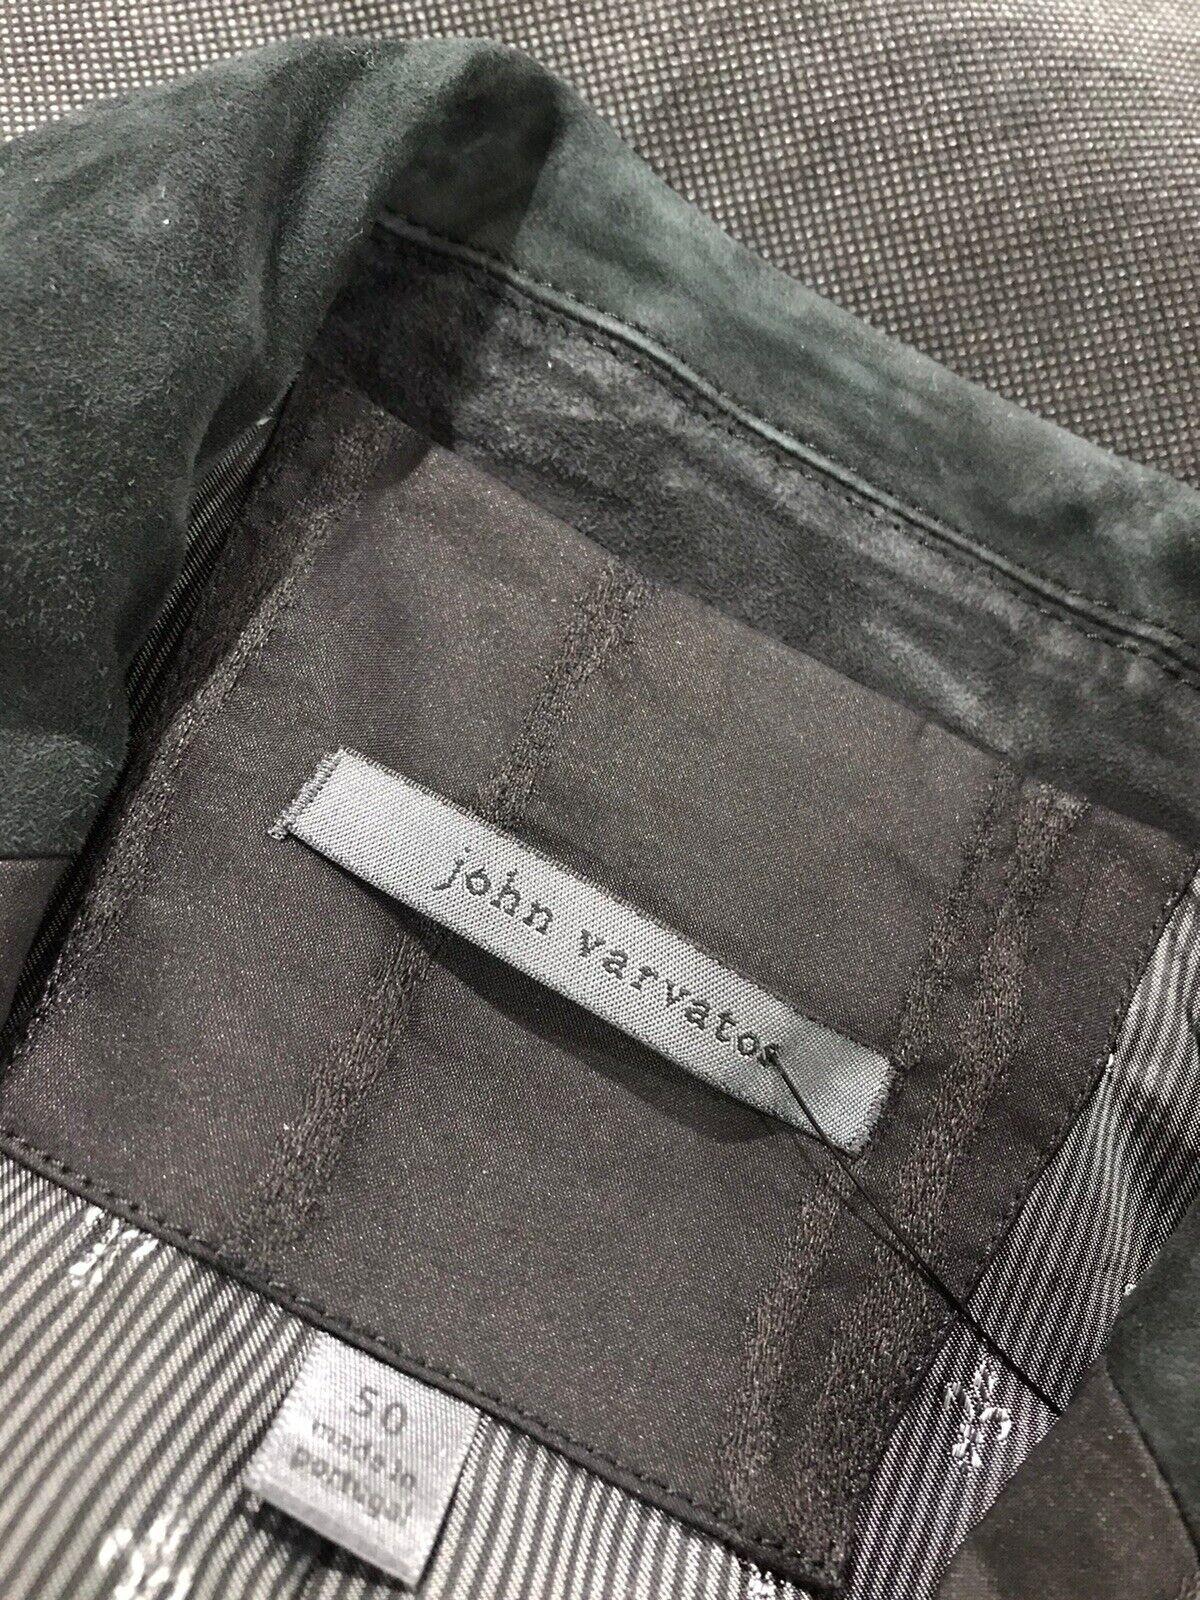 John Varvatos Suit. 50-52 R. $2000 - image 3